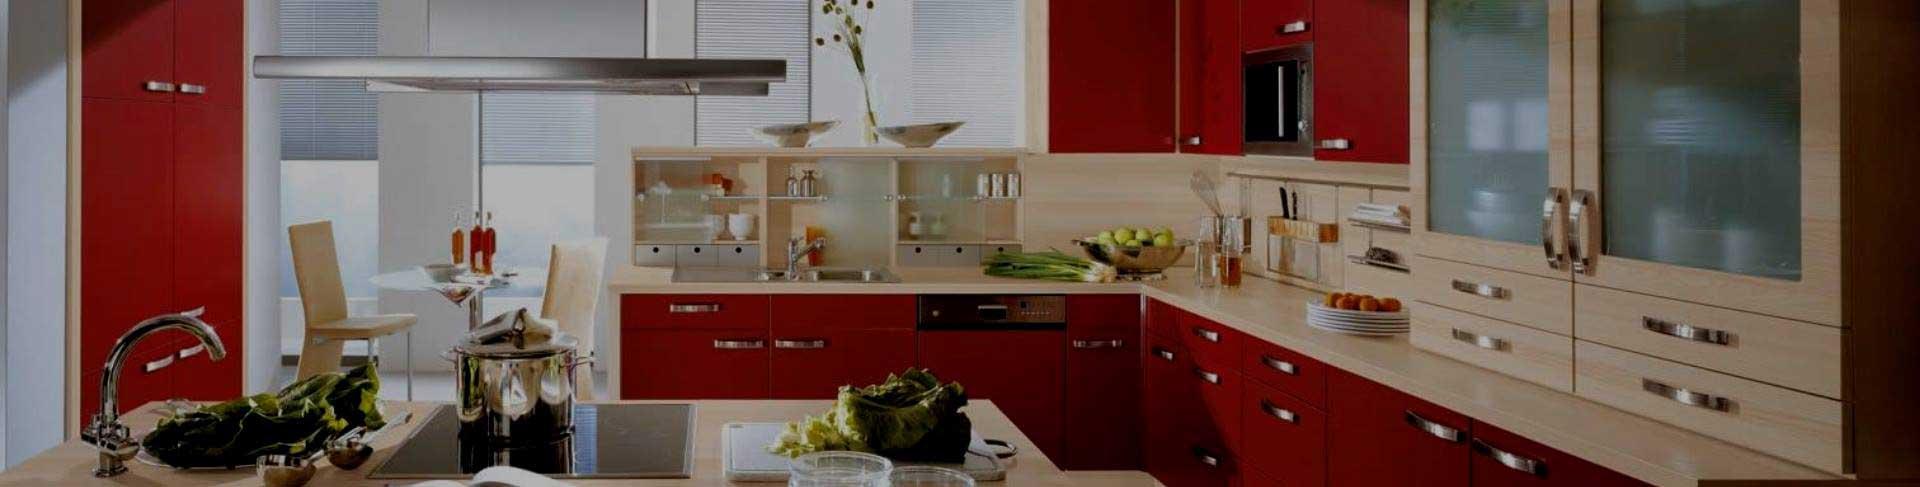 Cocinas a medida cocinas a medida with cocinas a medida - Cocinas a medida barcelona ...